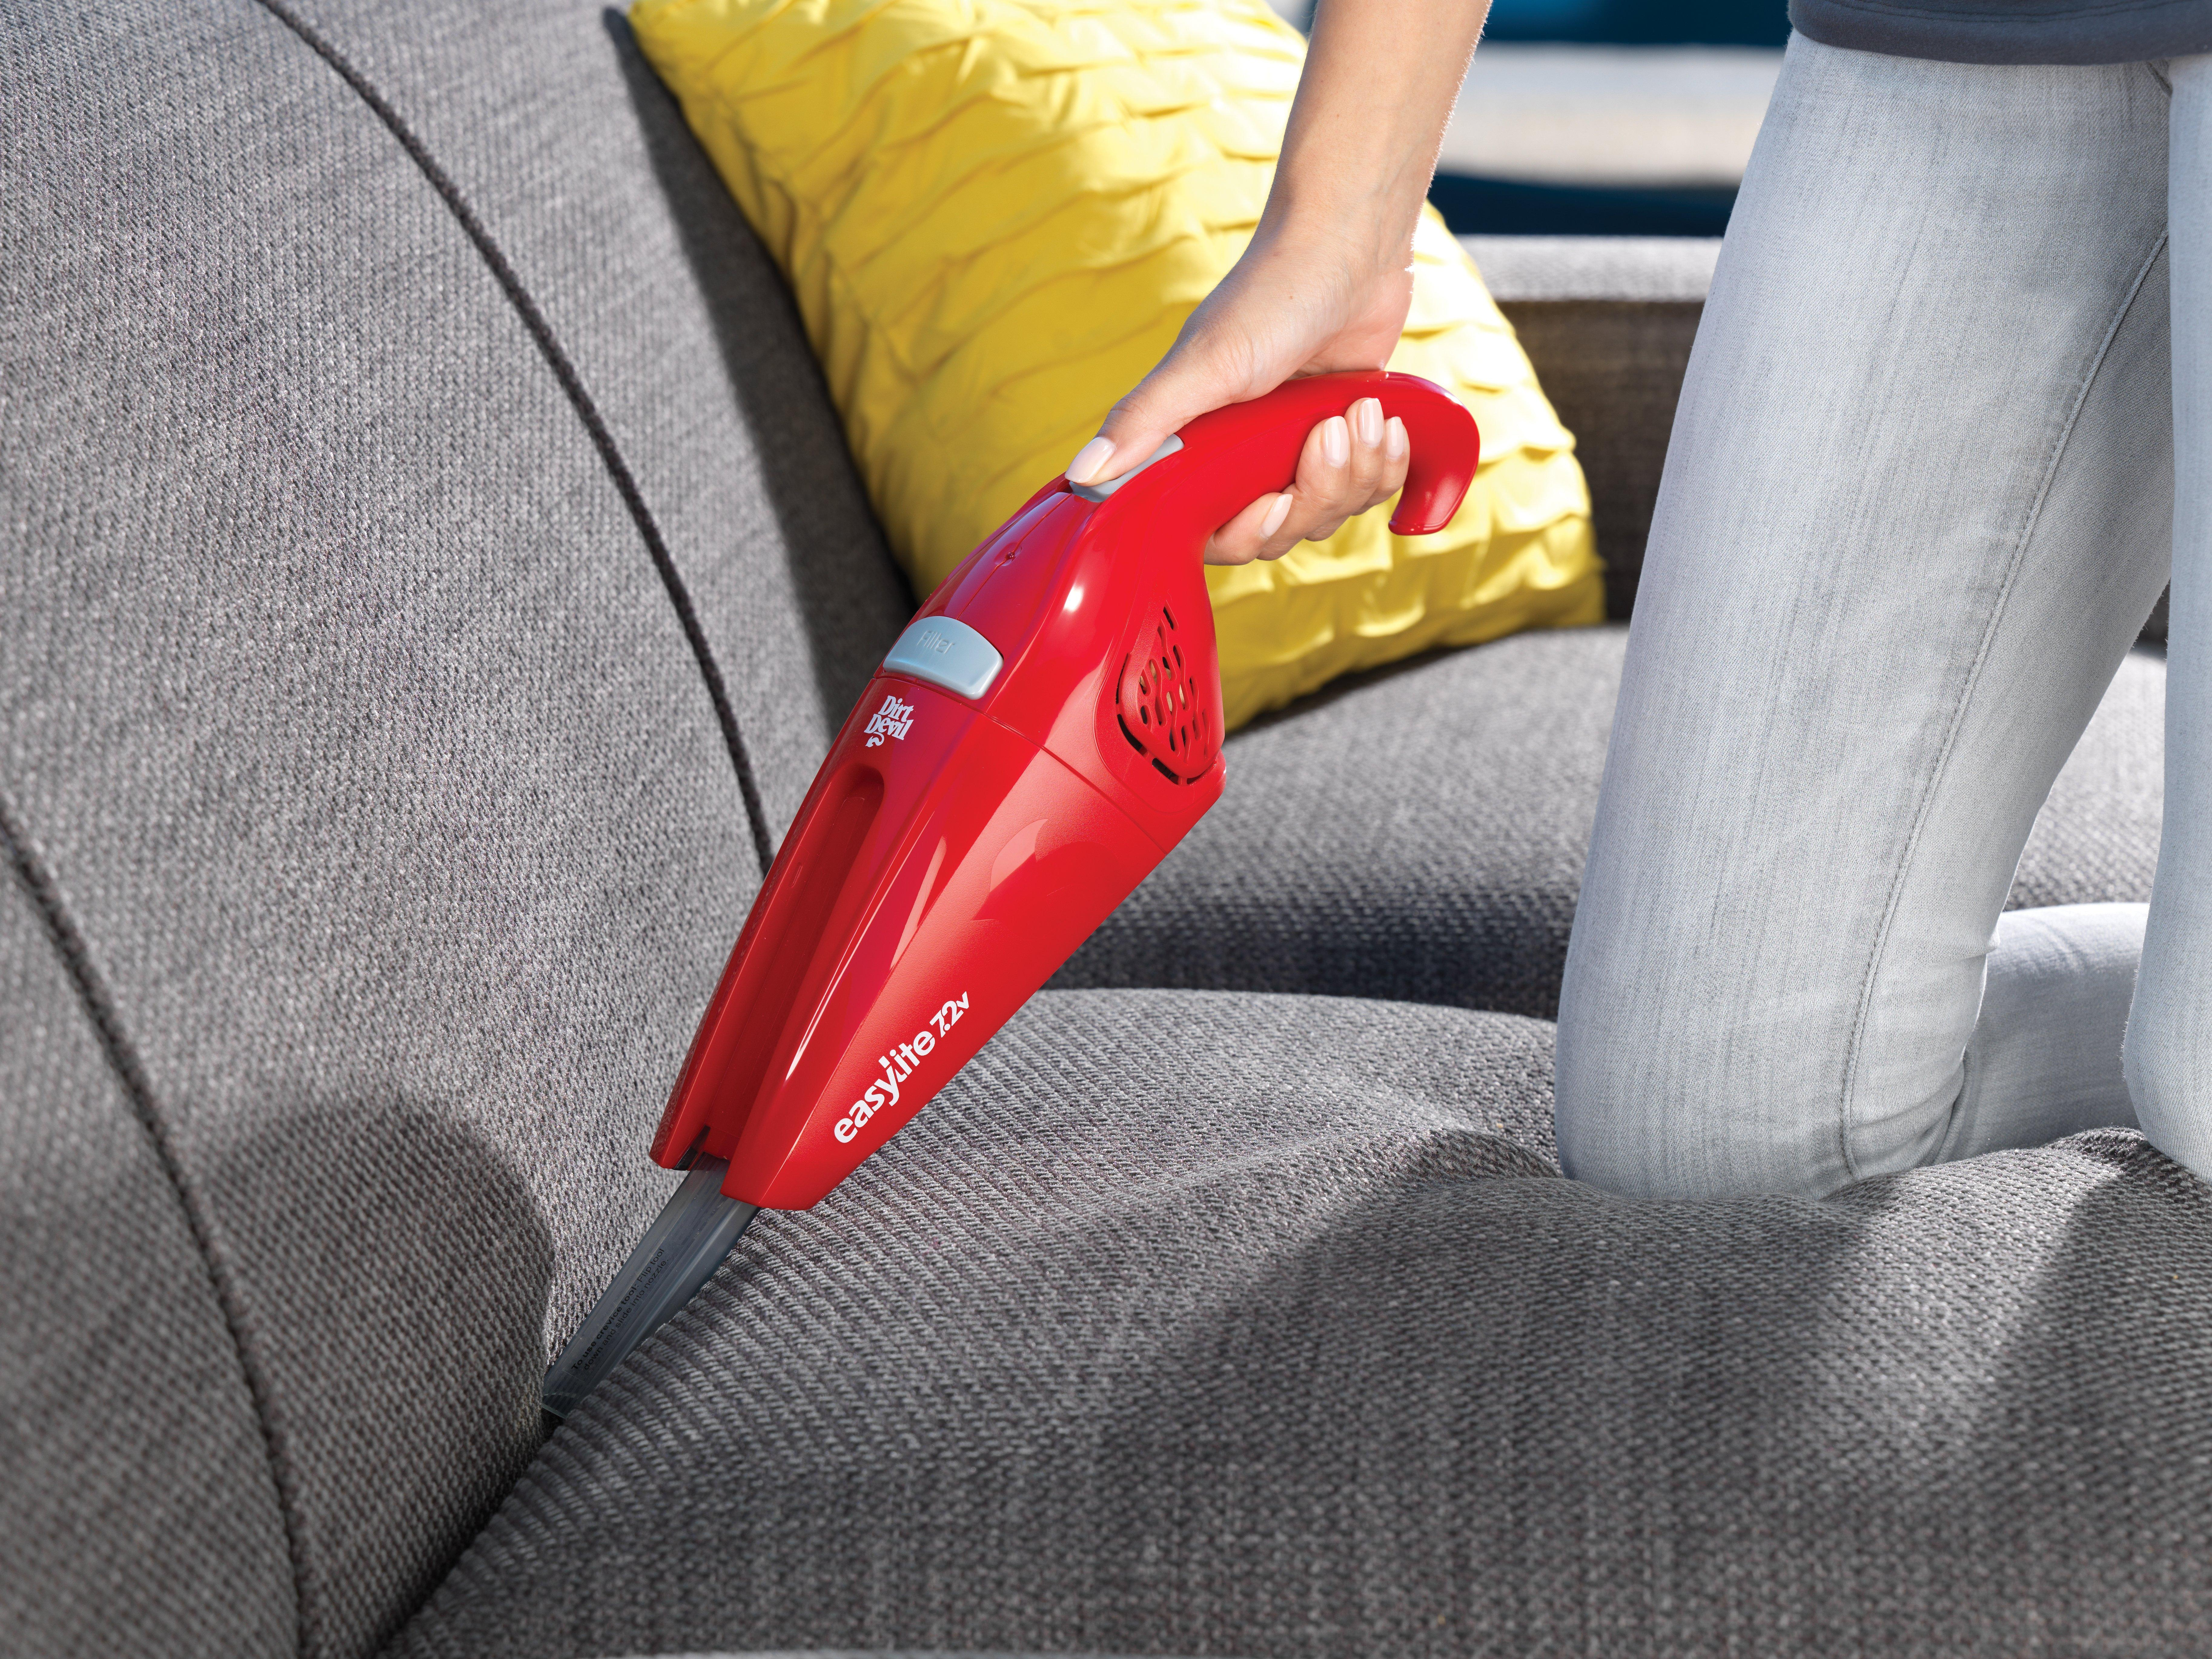 Easy Lite 7.2V Cordless Hand Vacuum7